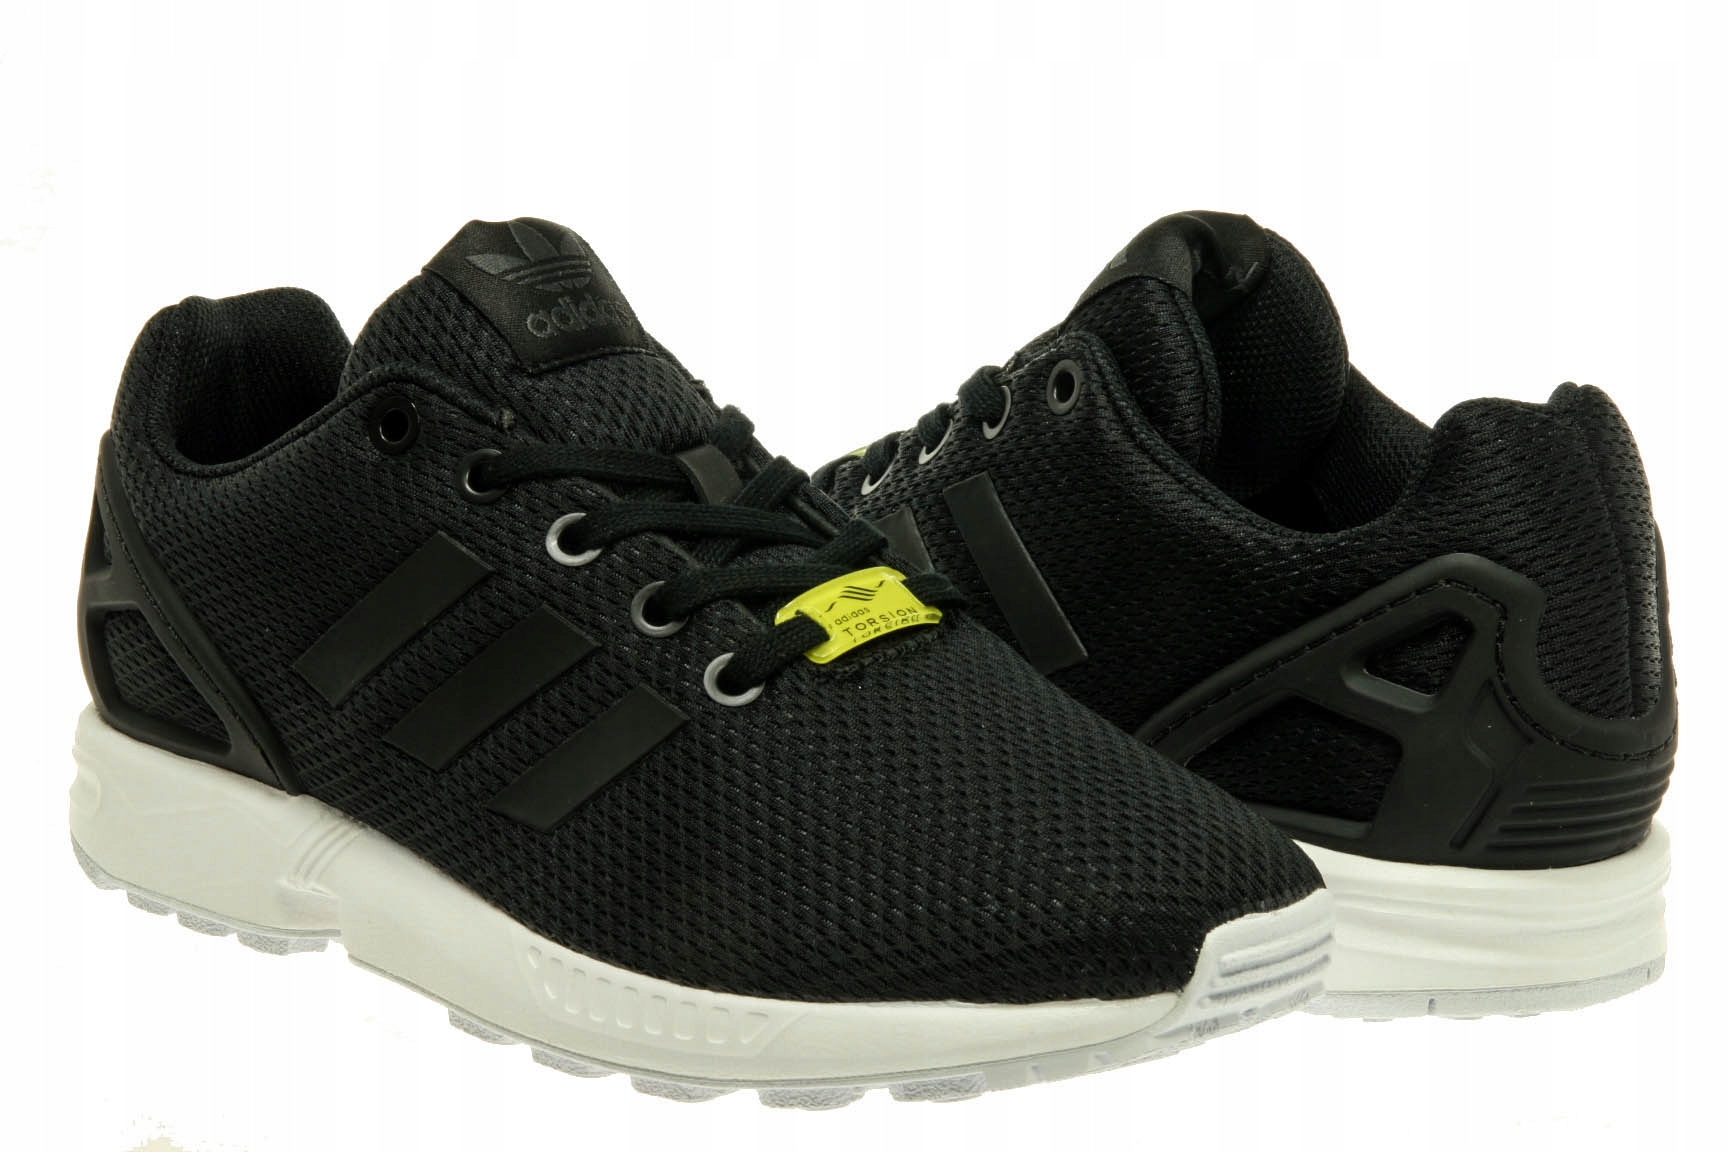 e5e941d77 Buty Damskie Adidas ZX FLUX J M21294 Czarne r. 40 - 7236870397 ...